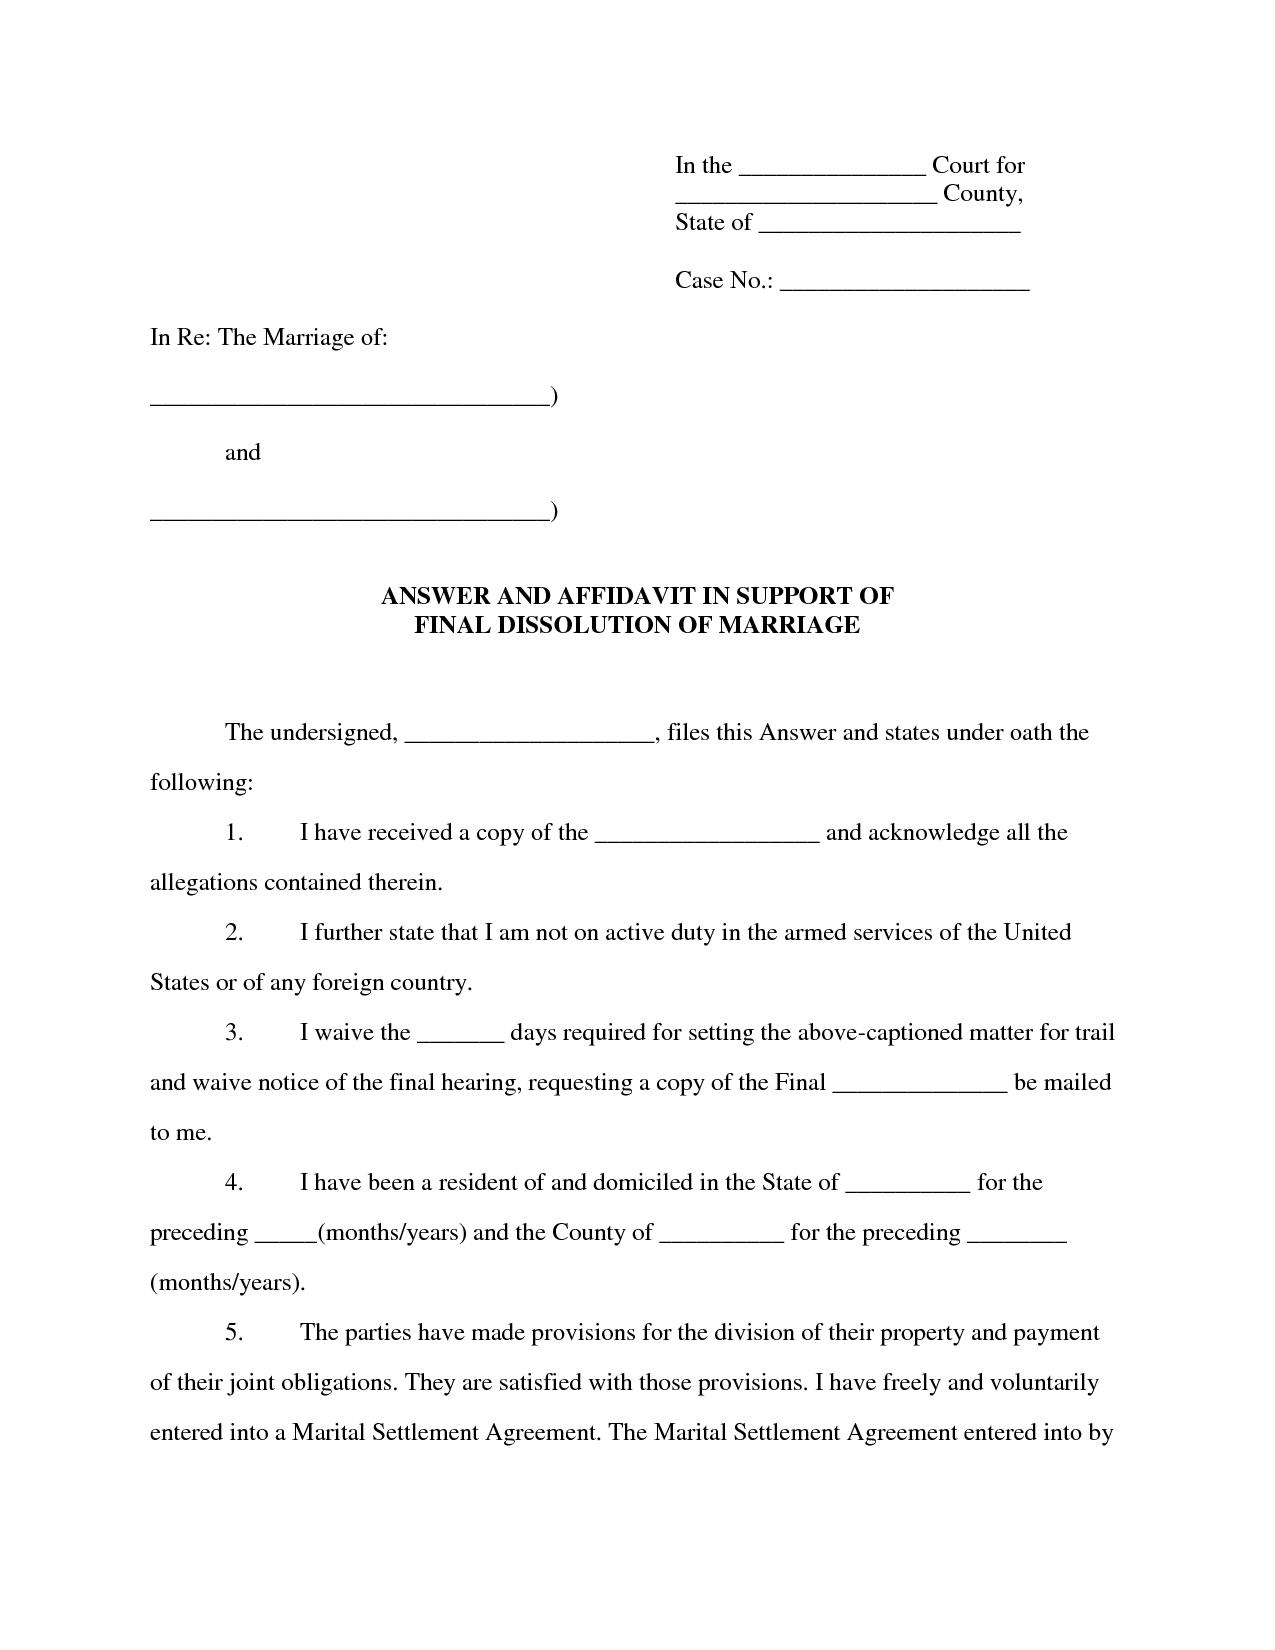 Affidavit Format For Love Marriage